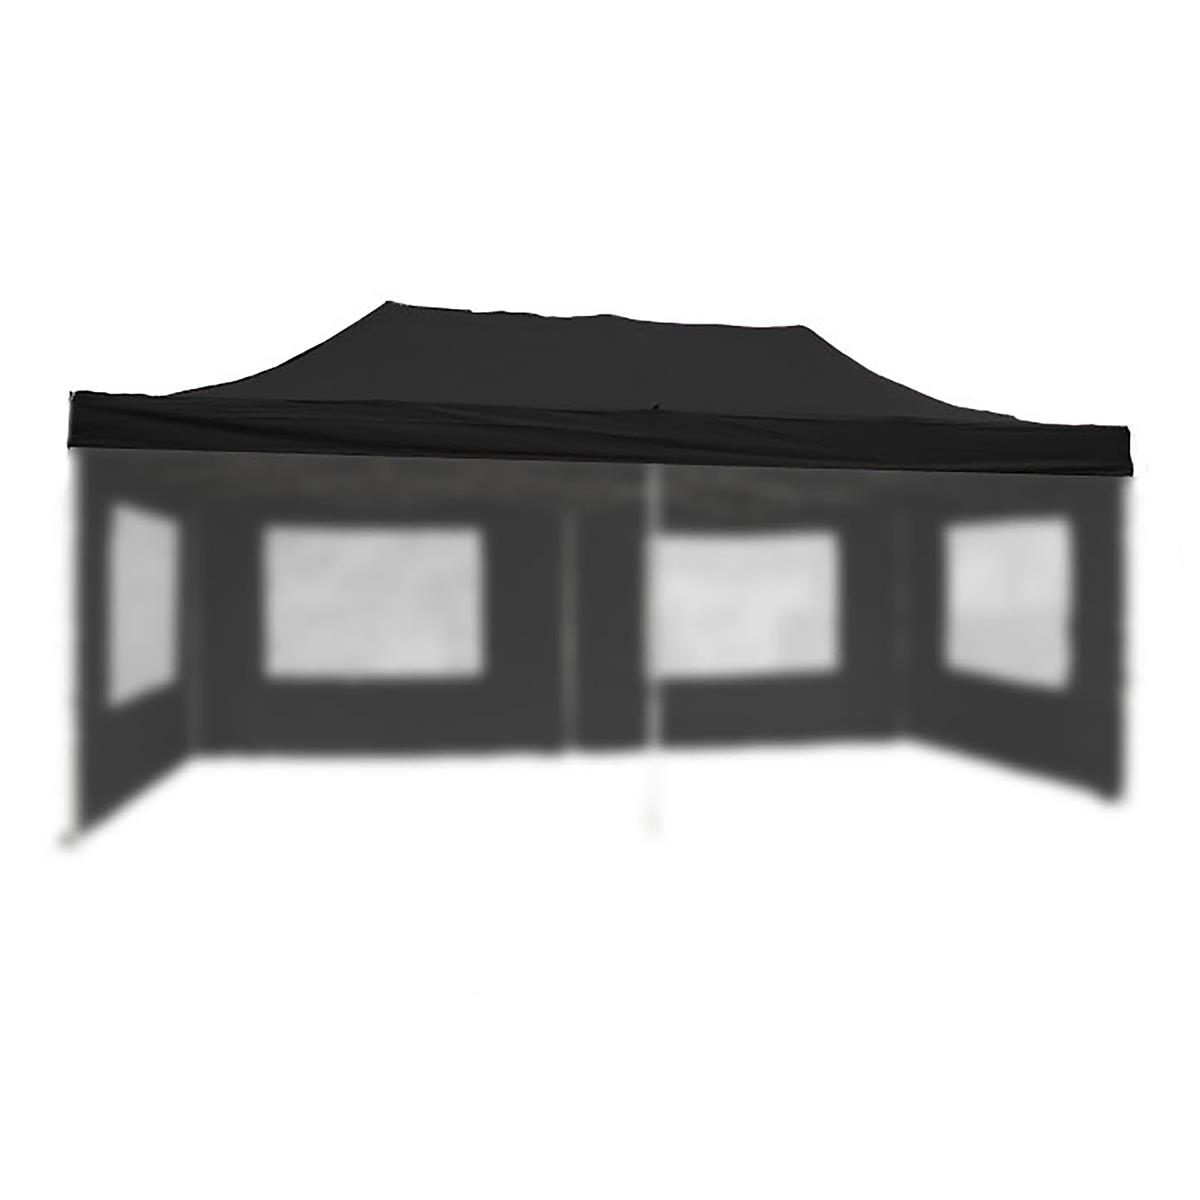 Ersatzdach für PROFI Falt Pavillon 3x6m schwarz wasserdicht Dachplane Zeltdach